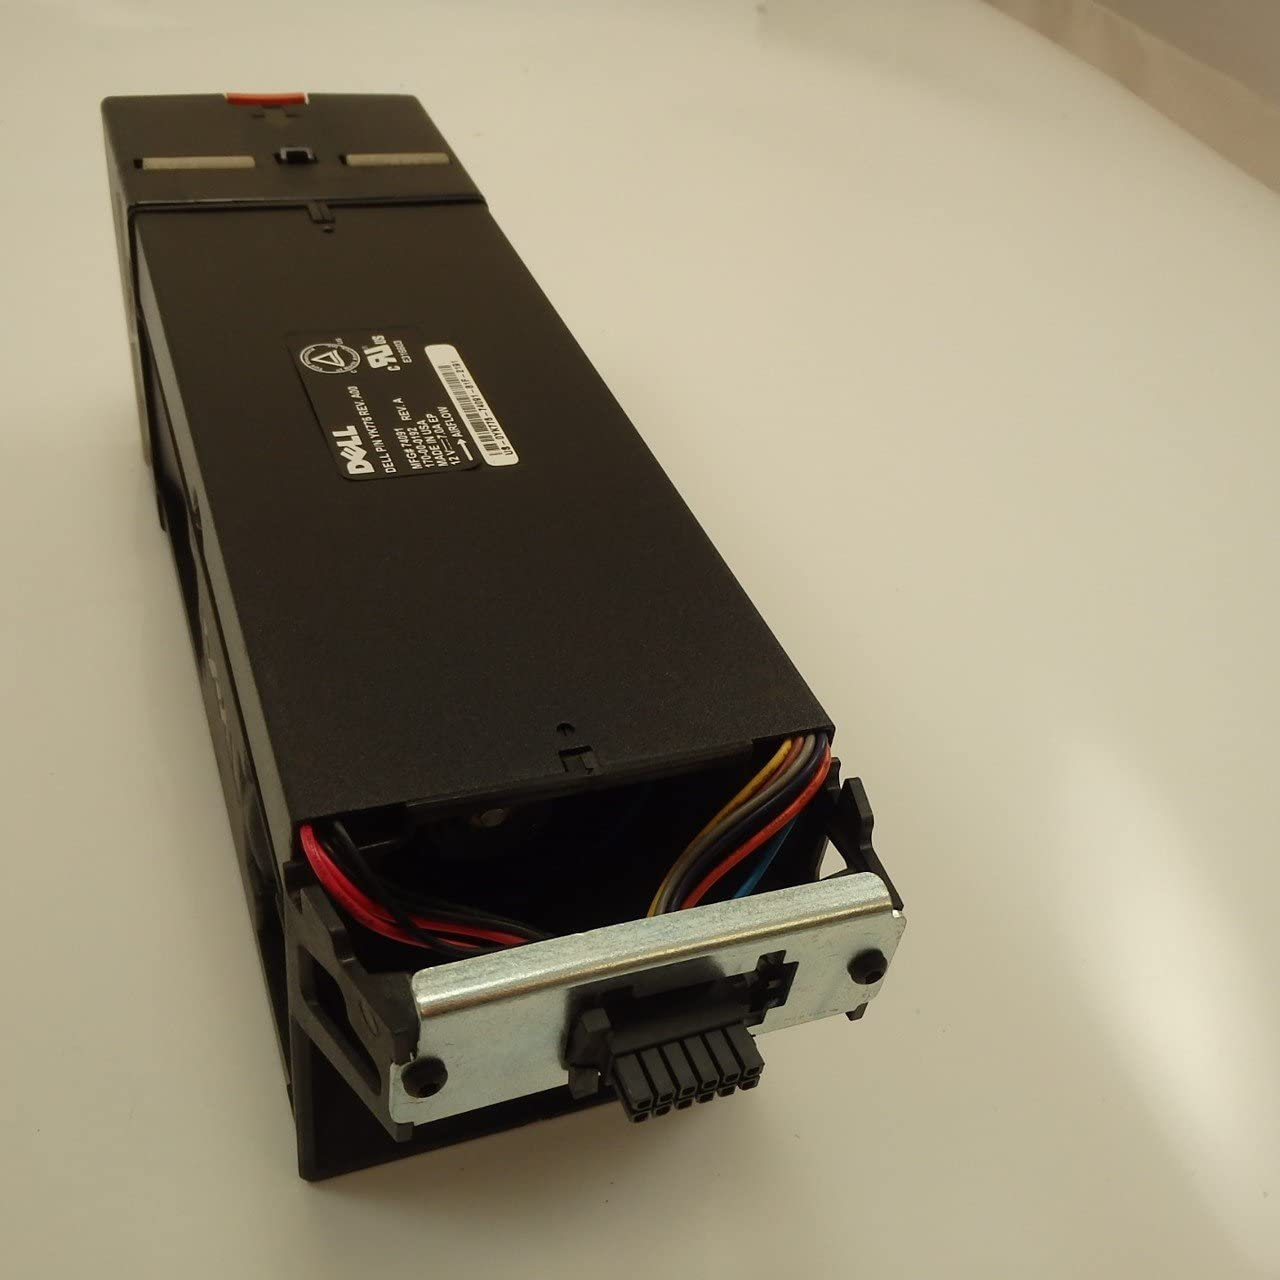 YK776 - DELL POWEREDGE M1000E FAN ASSEMBLY